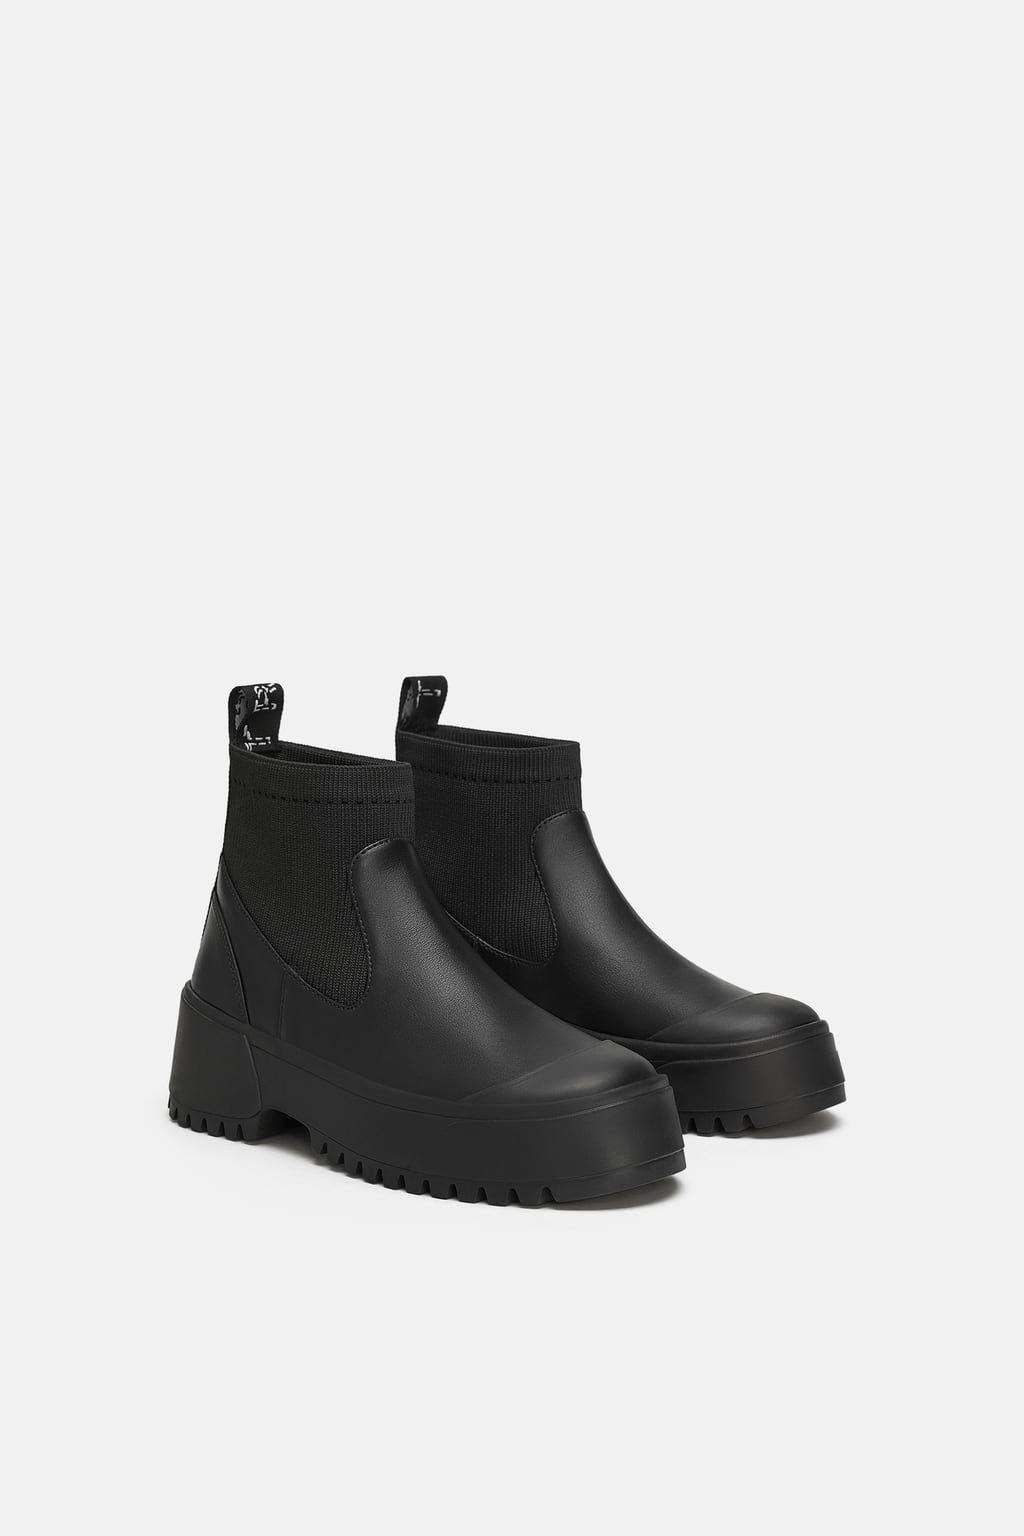 Stiefel, Schwarze stiefel flach